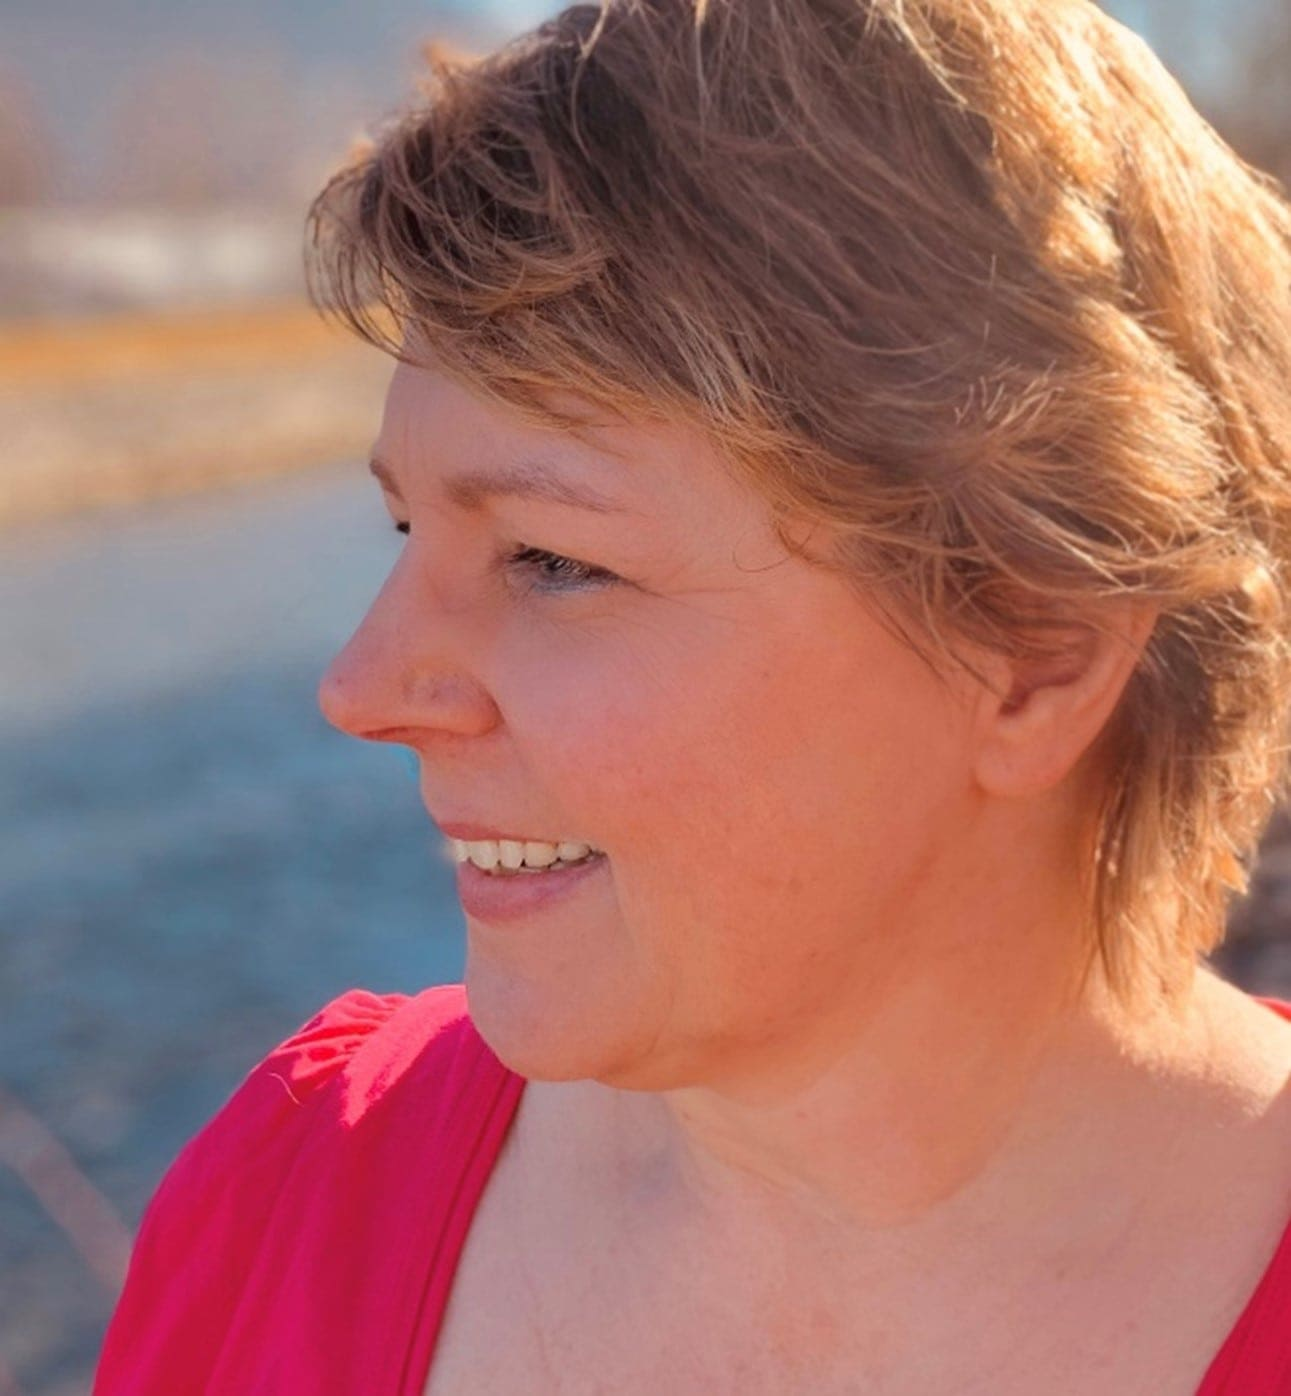 Diana Rinderer - FreiSein